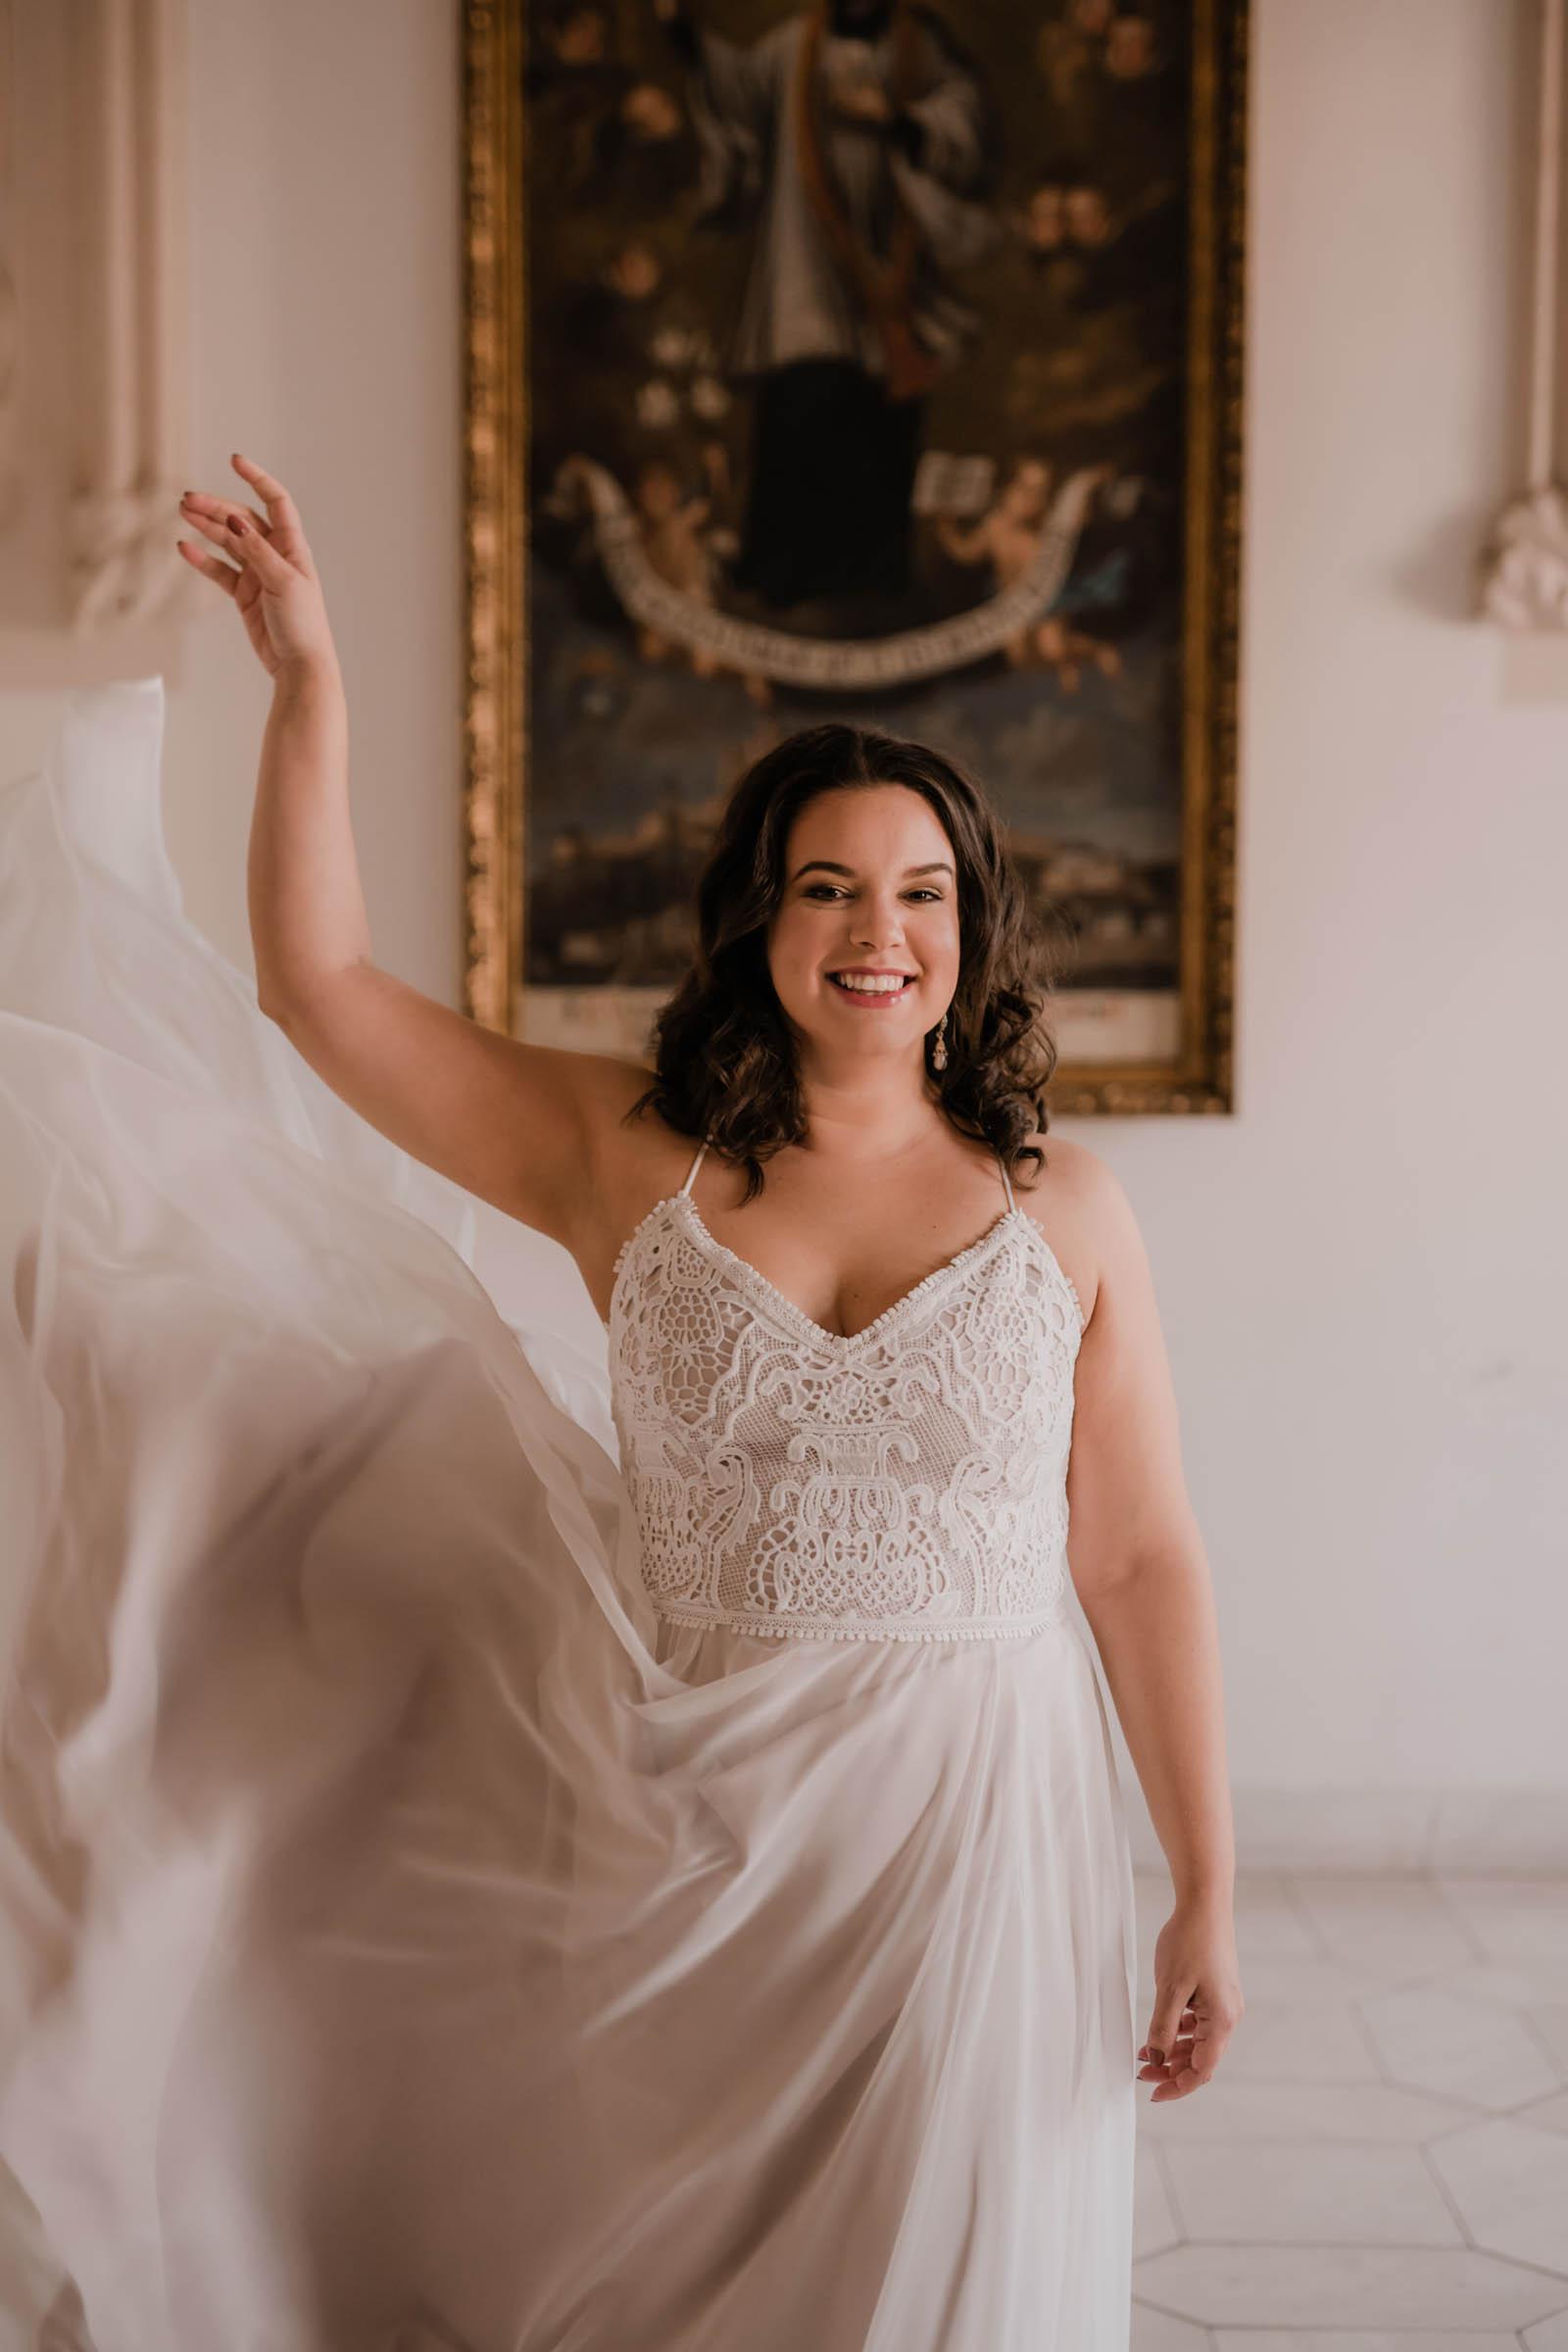 boho-svadobne-saty-veronika-kostkova-wedding-atelier-2019-tavia-1